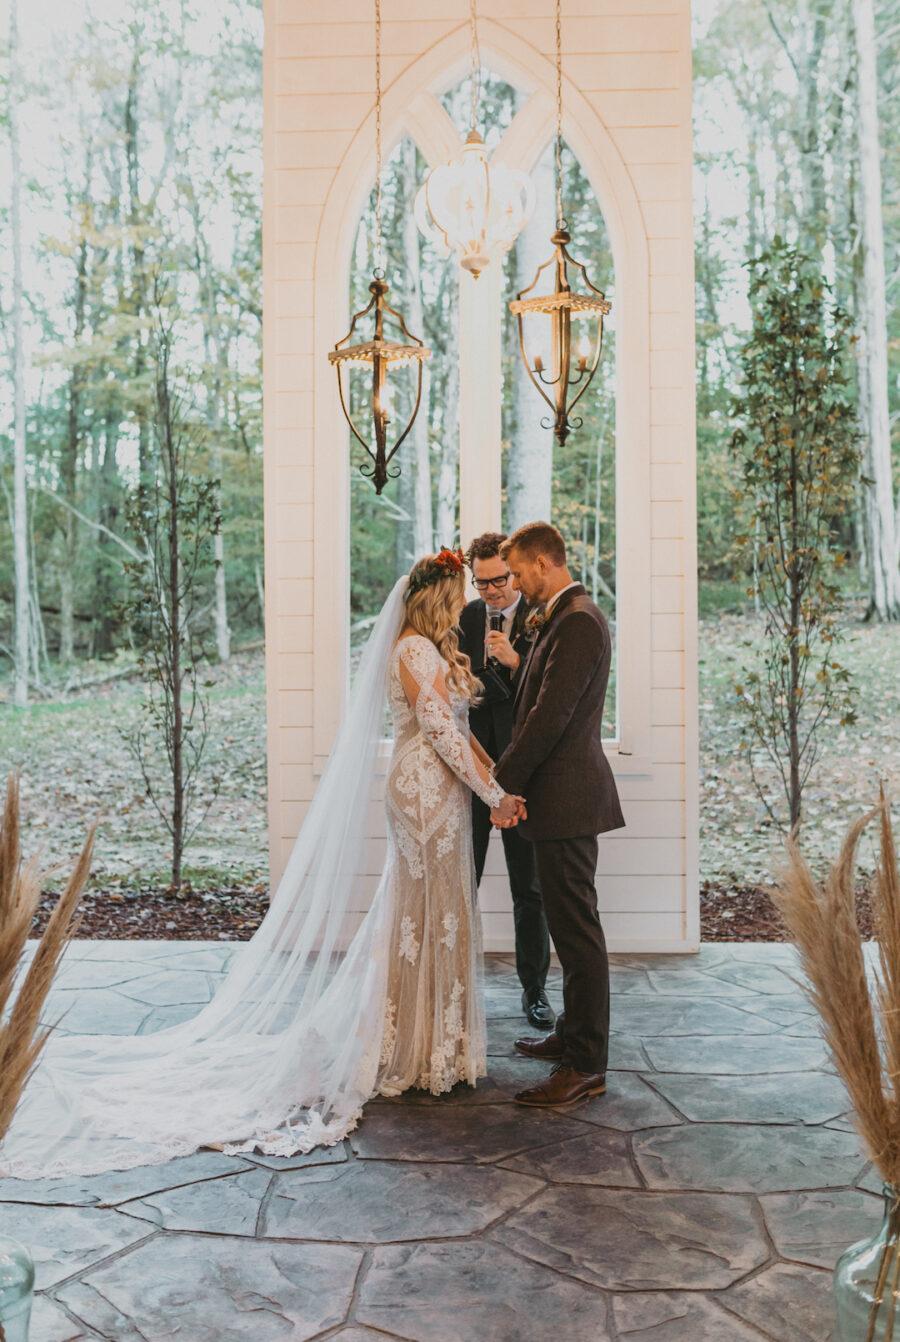 Semi outdoor wedding ceremony at Firefly Lane